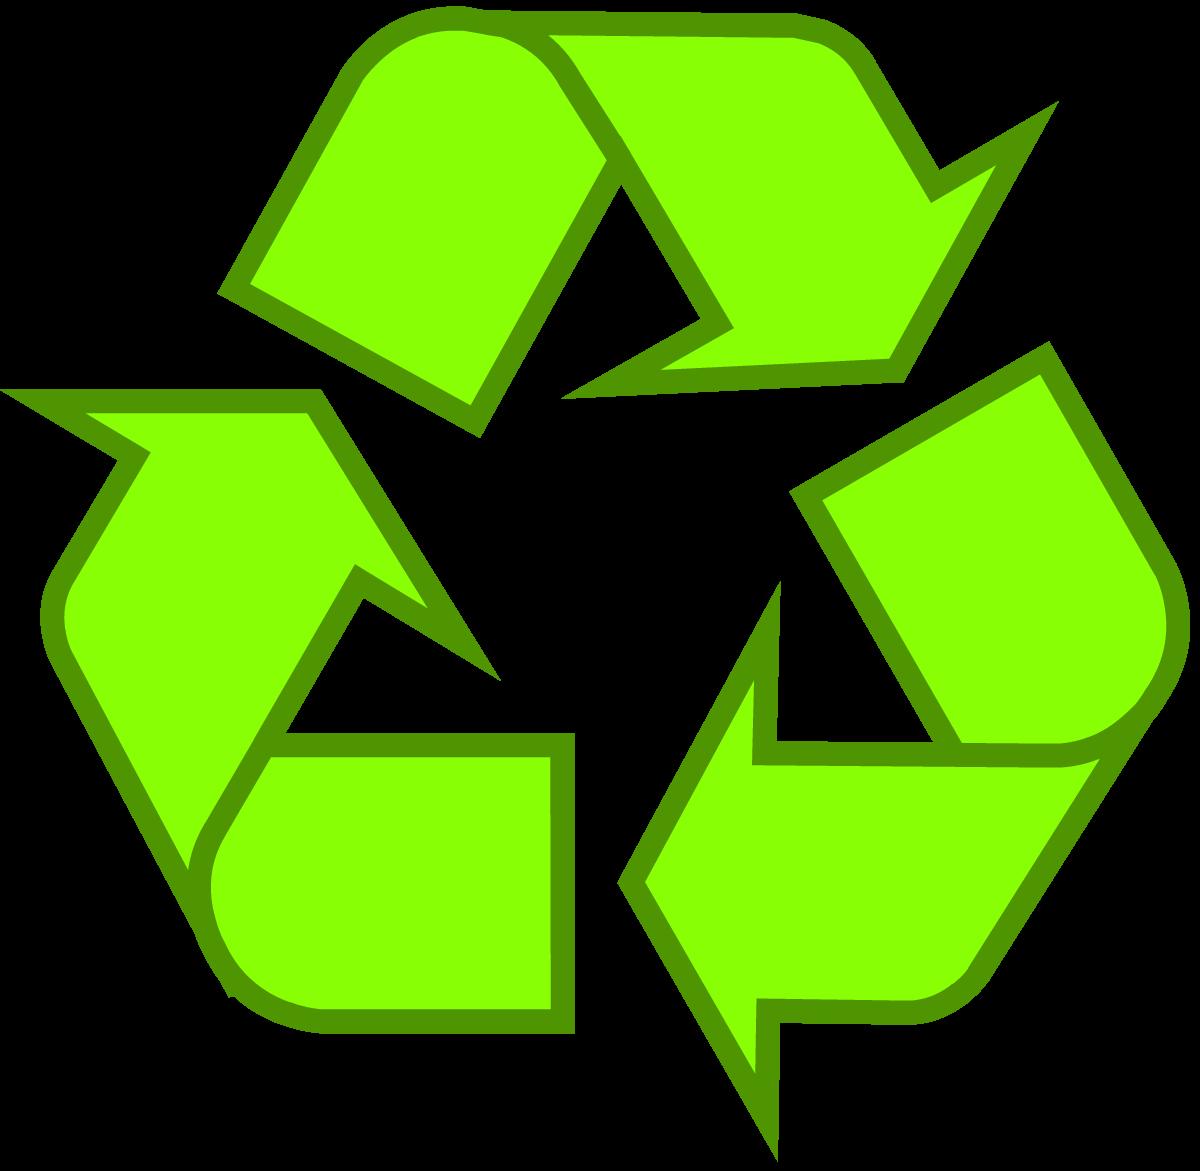 Light Green Universal Recycling Symbol Logo Sign Httpwww